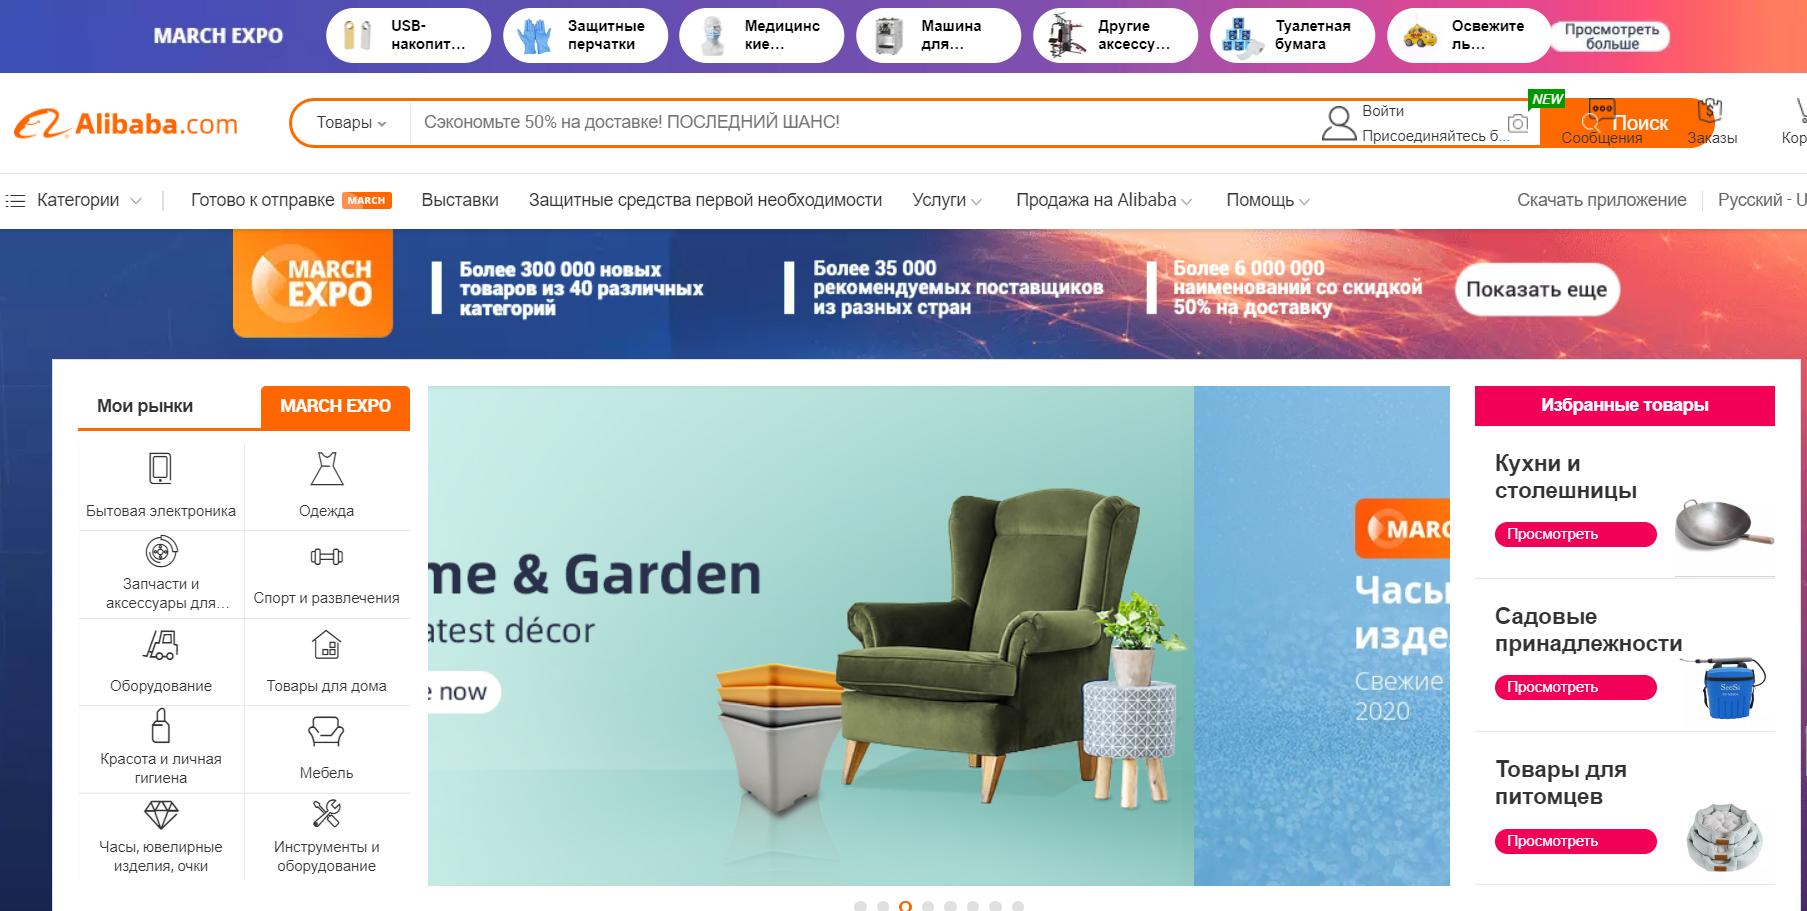 Торговая онлайн-платформа Alibaba